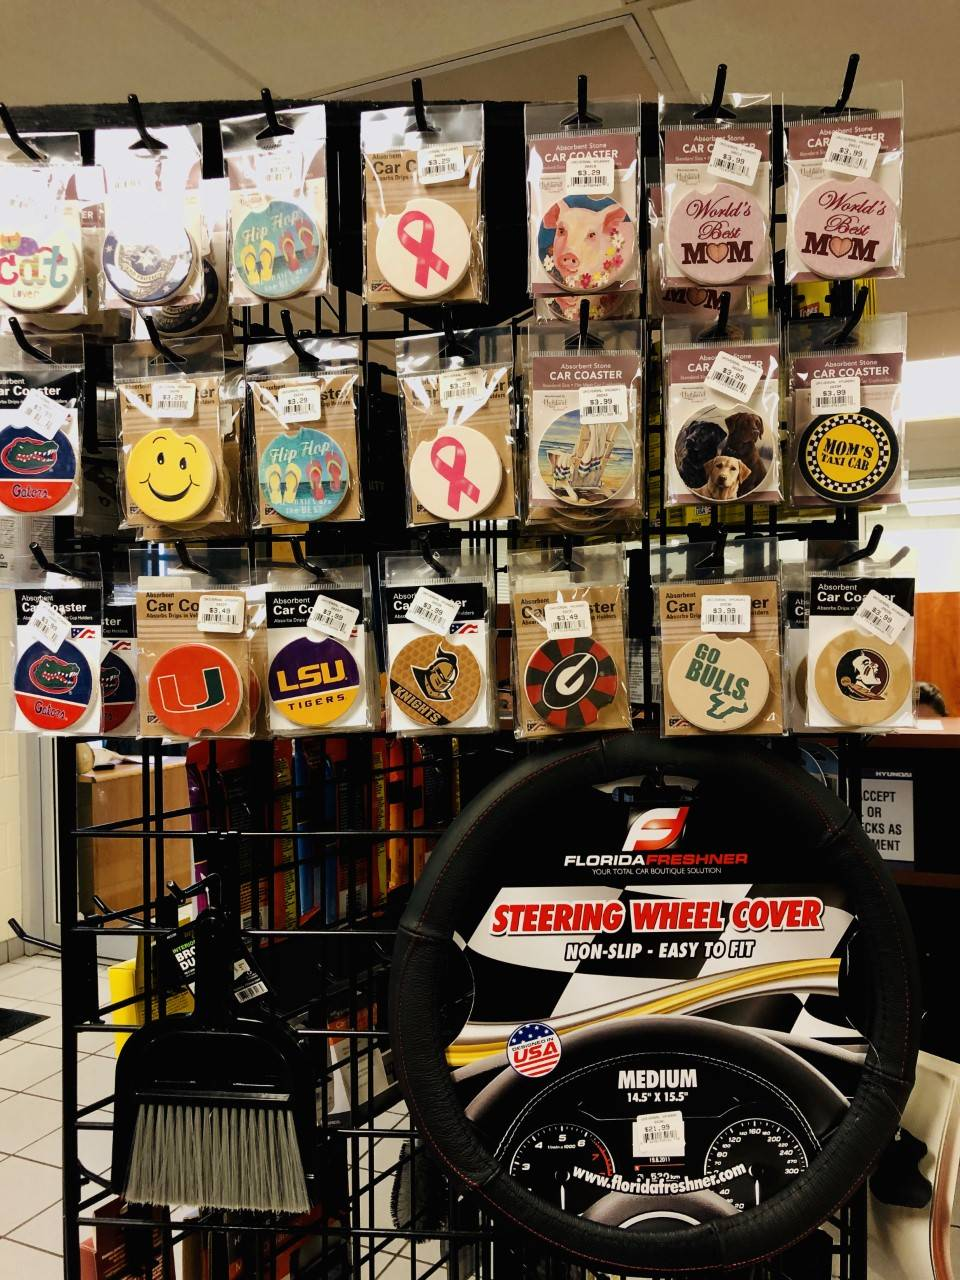 Universal Hyundai Parts Center - car repair  | Photo 4 of 10 | Address: 12801 S Orange Blossom Trail, Orlando, FL 32837, USA | Phone: (407) 545-8495